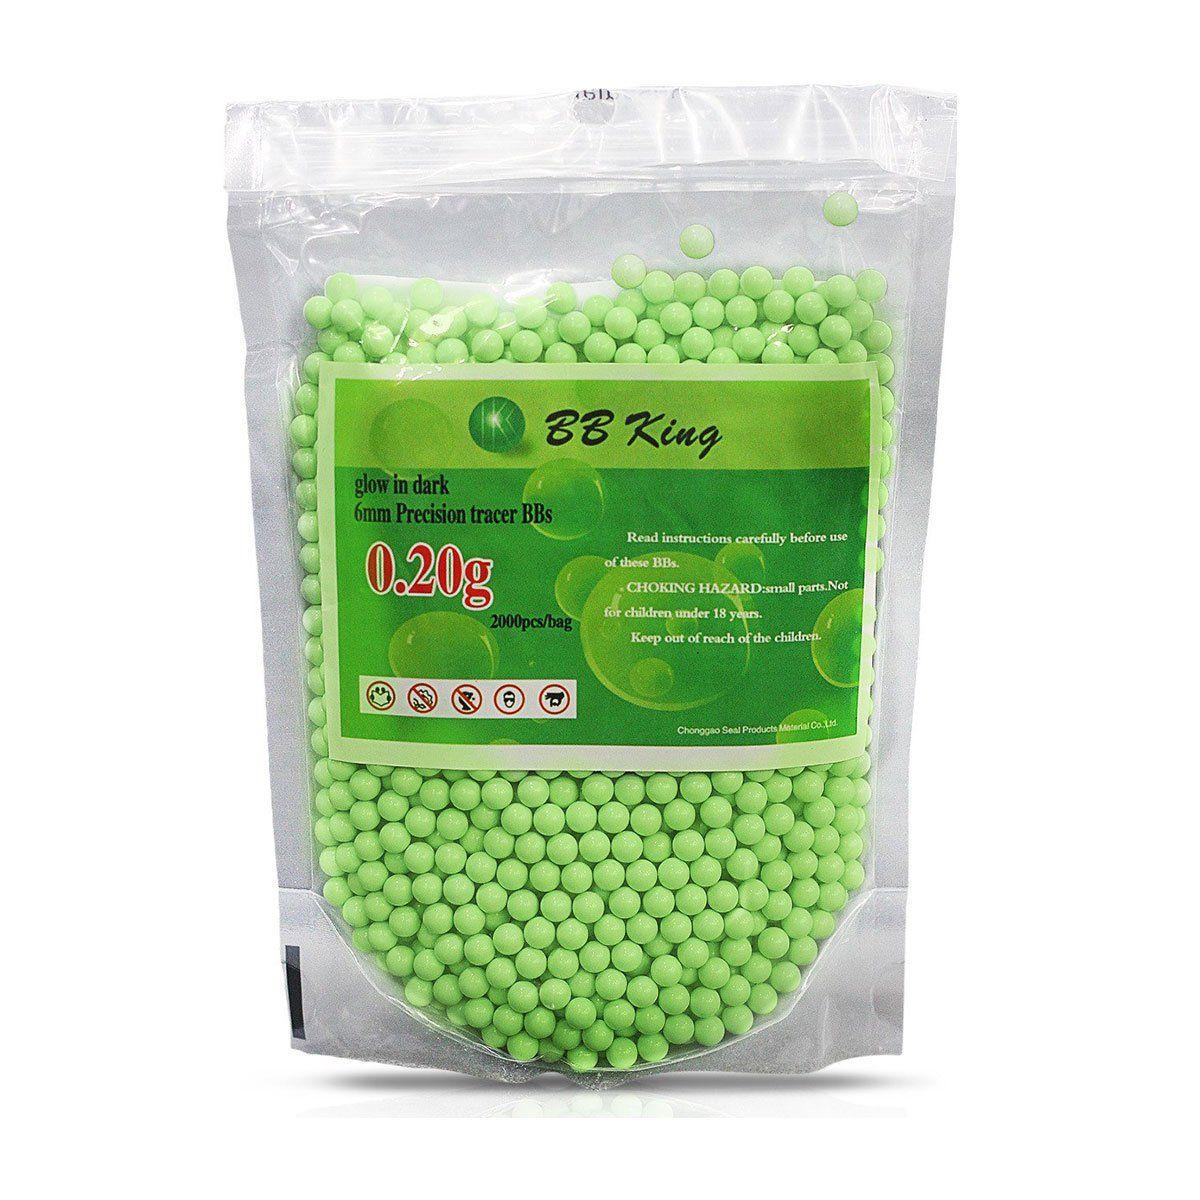 Esferas plásticas BBs BB King Trancer Calibre 6 mm 0,20g 2000un